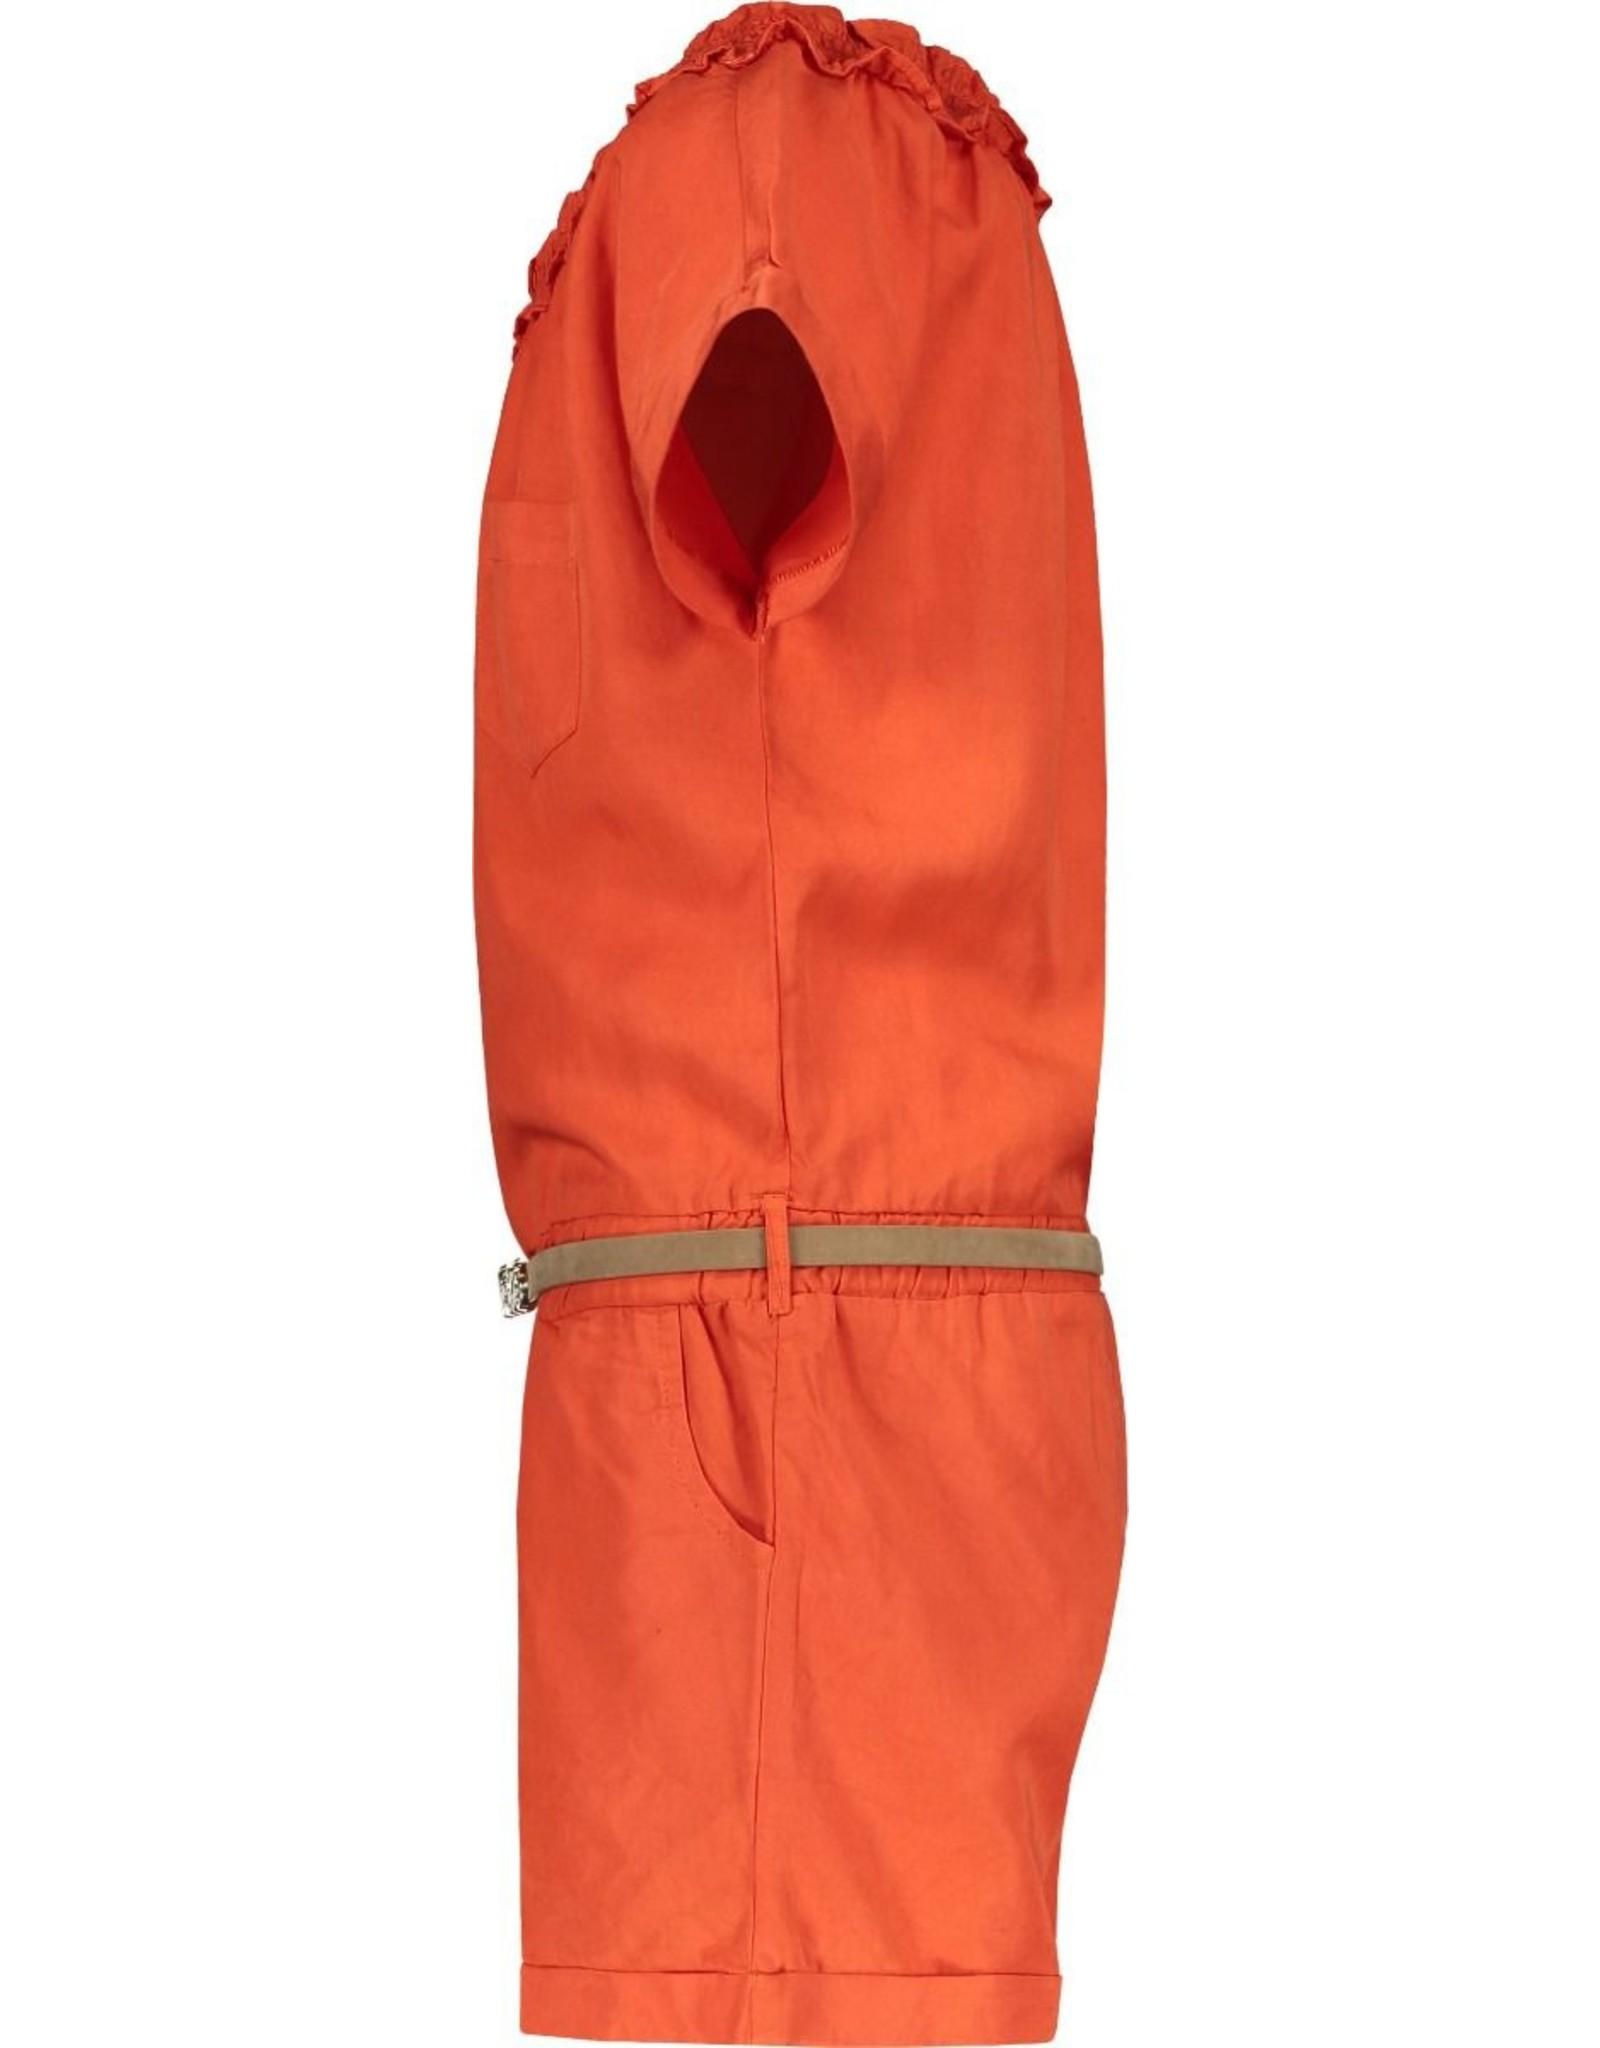 Like Flo girls tencell jumpsuit Orange